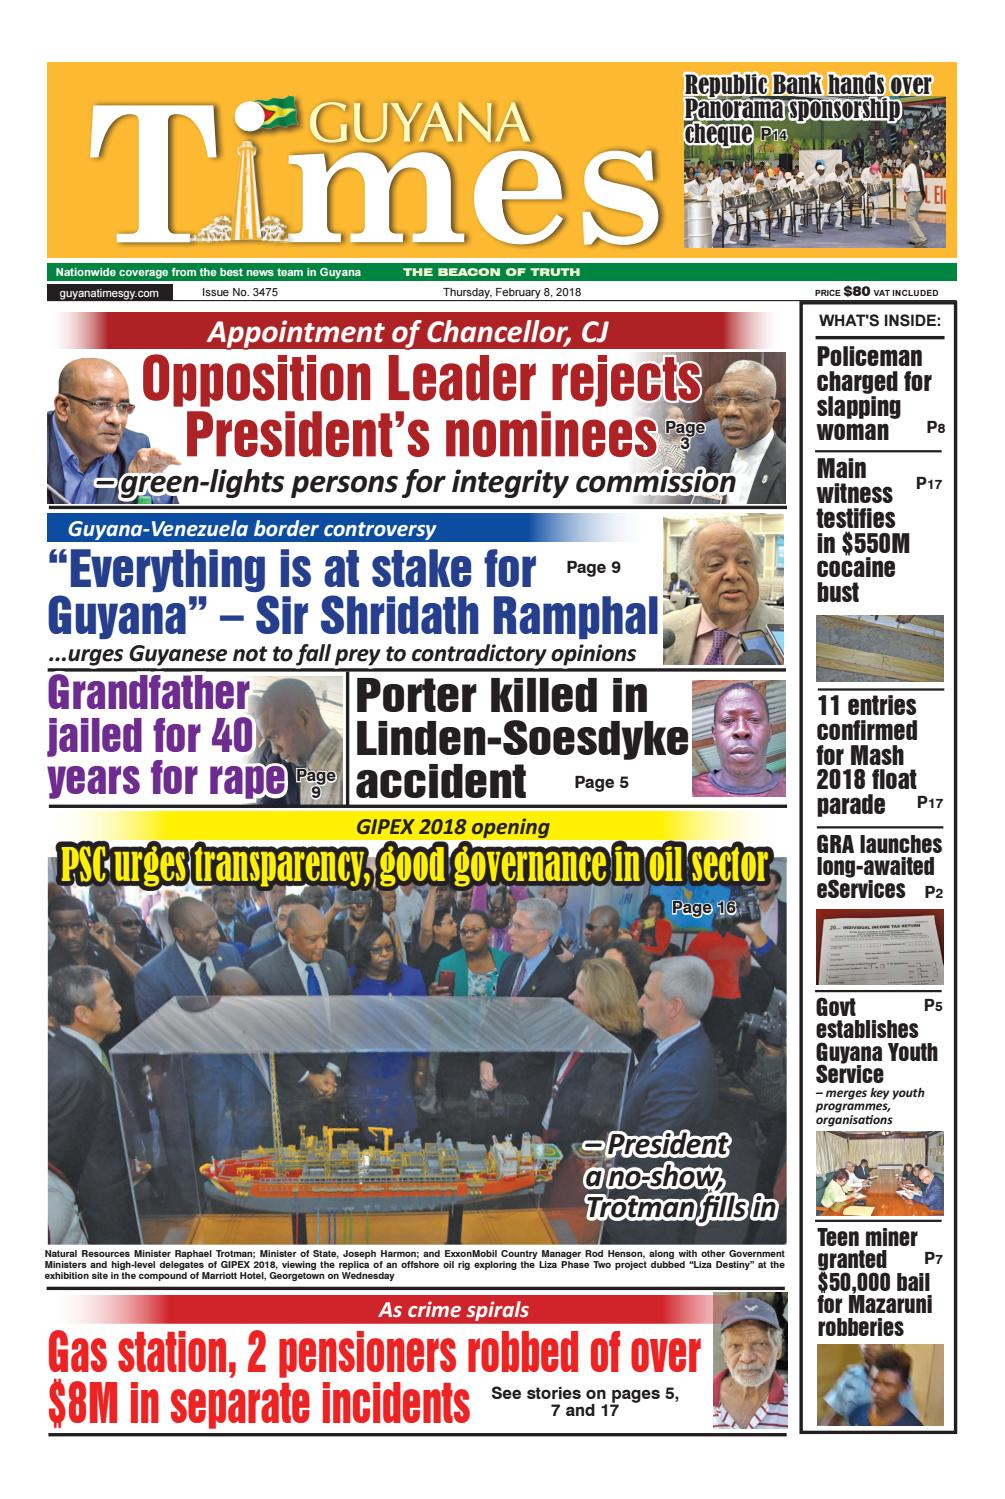 Guyanatimes 8 february 2018 by Gytimes - issuu